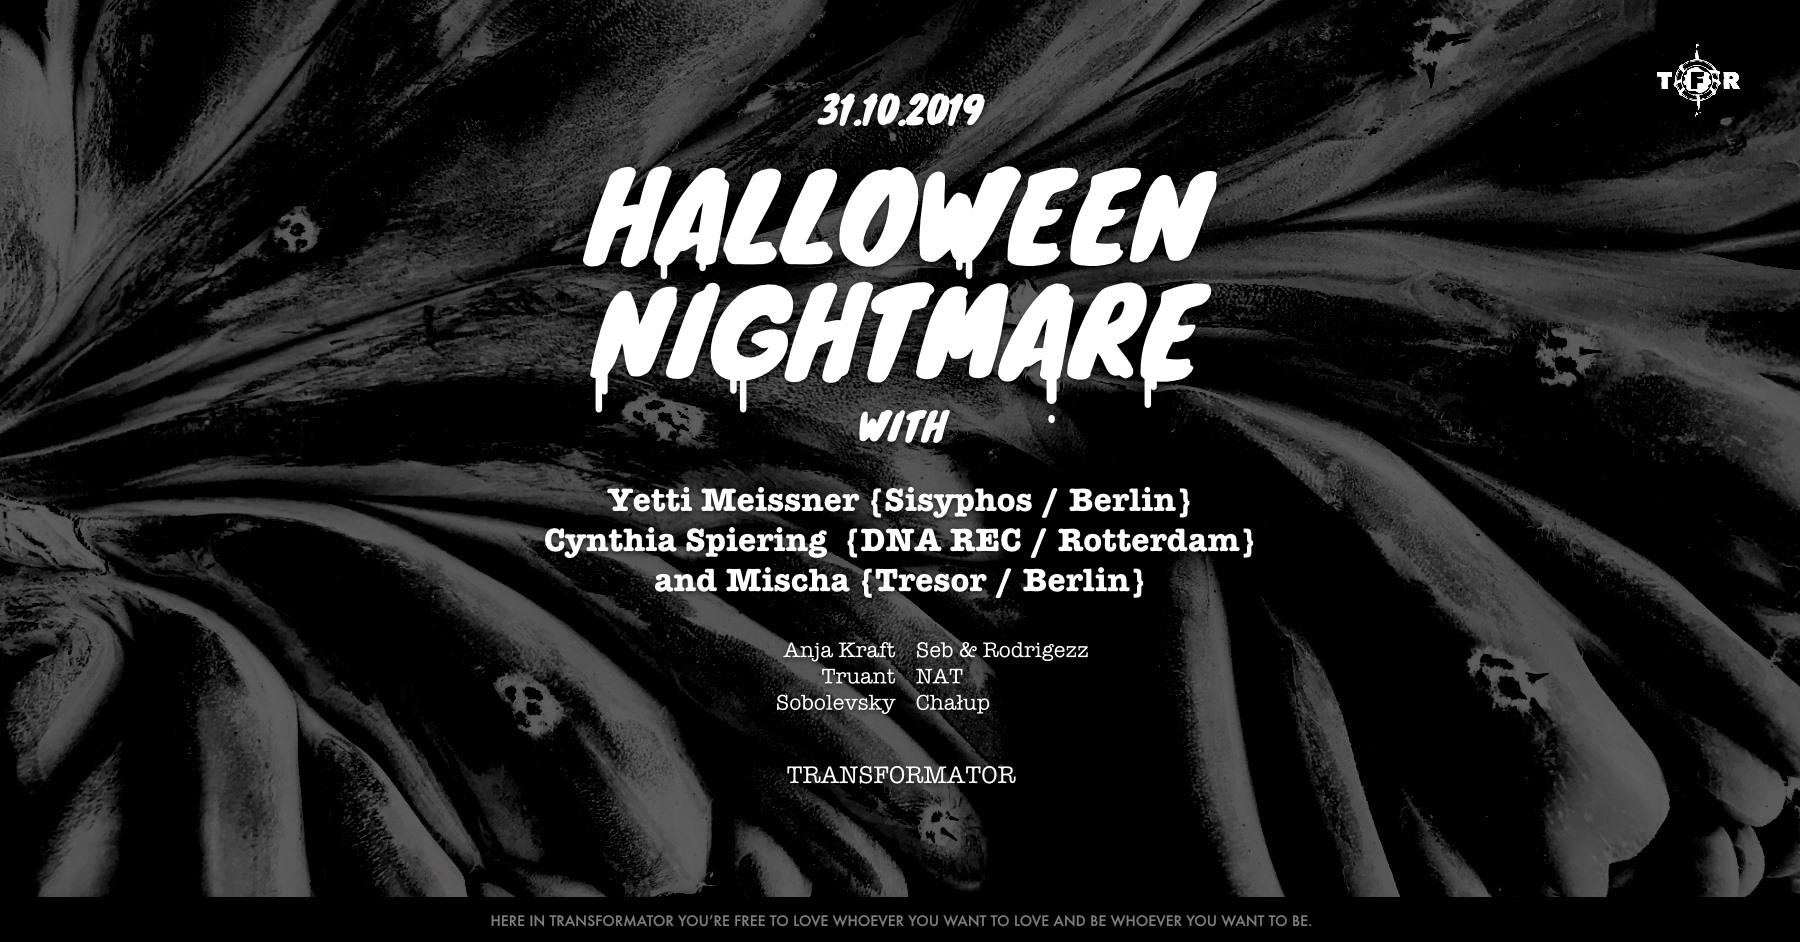 Halloween Nightmare Transformator